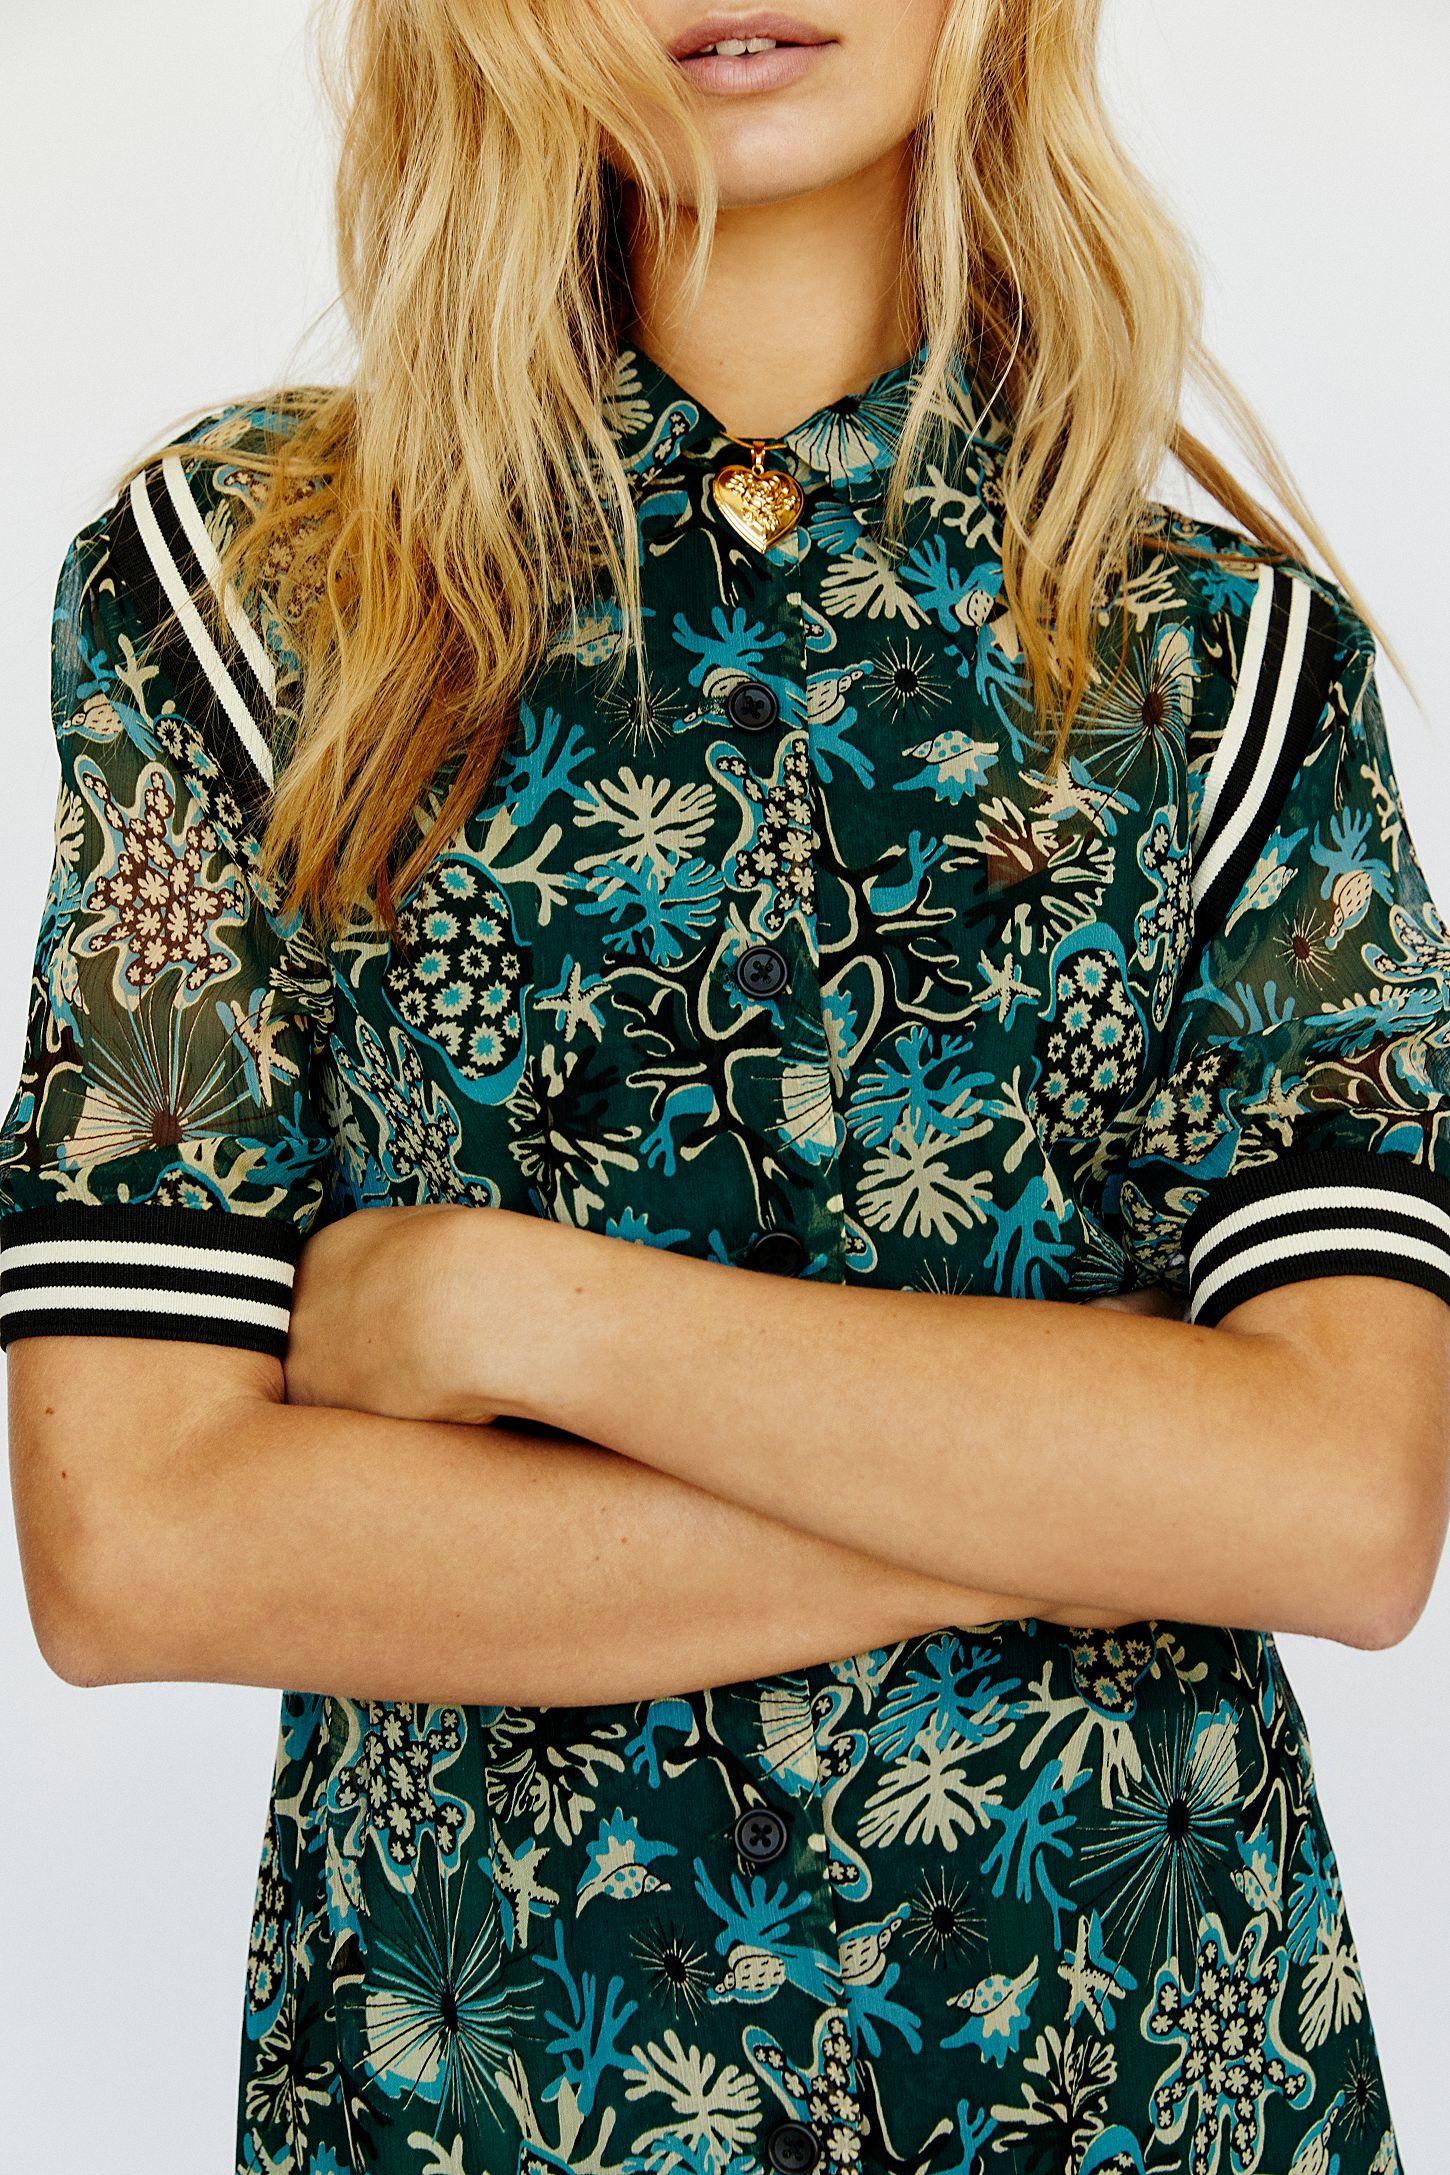 076d86812de0 Slide View 5: Coral Star Chiffon Maxi Shirt Dress